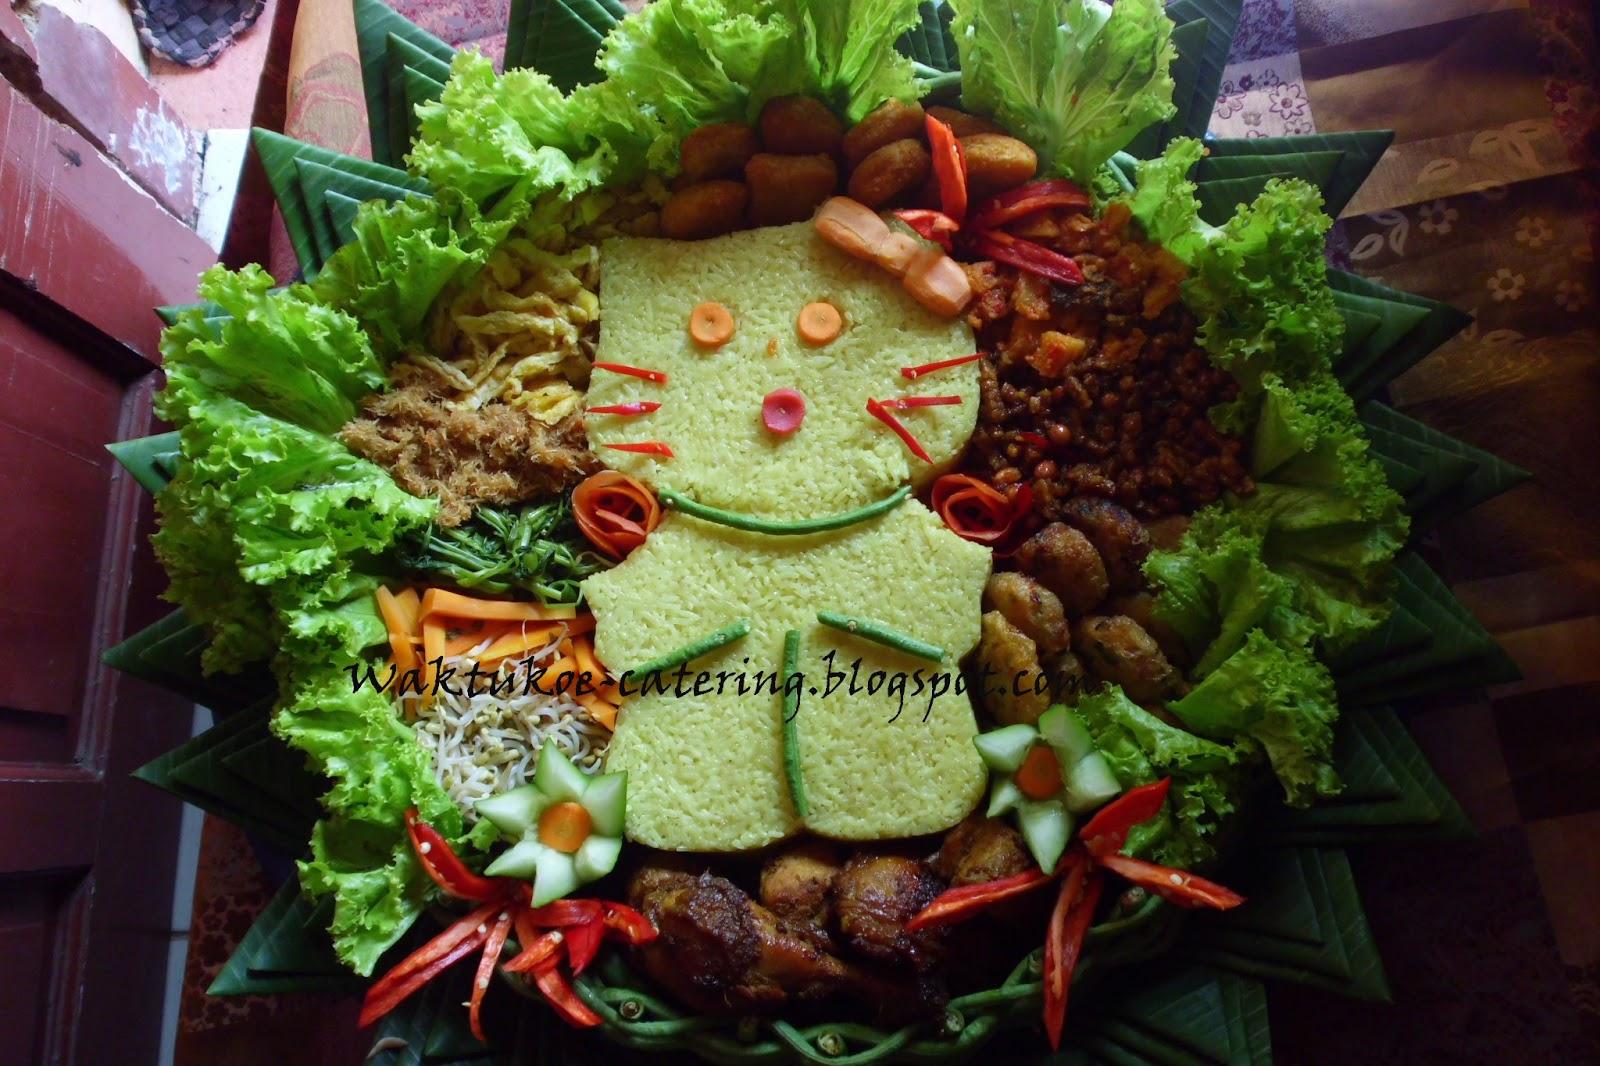 Quot Waktukoe Quot Home Catering And Cakes In Karawang Barat